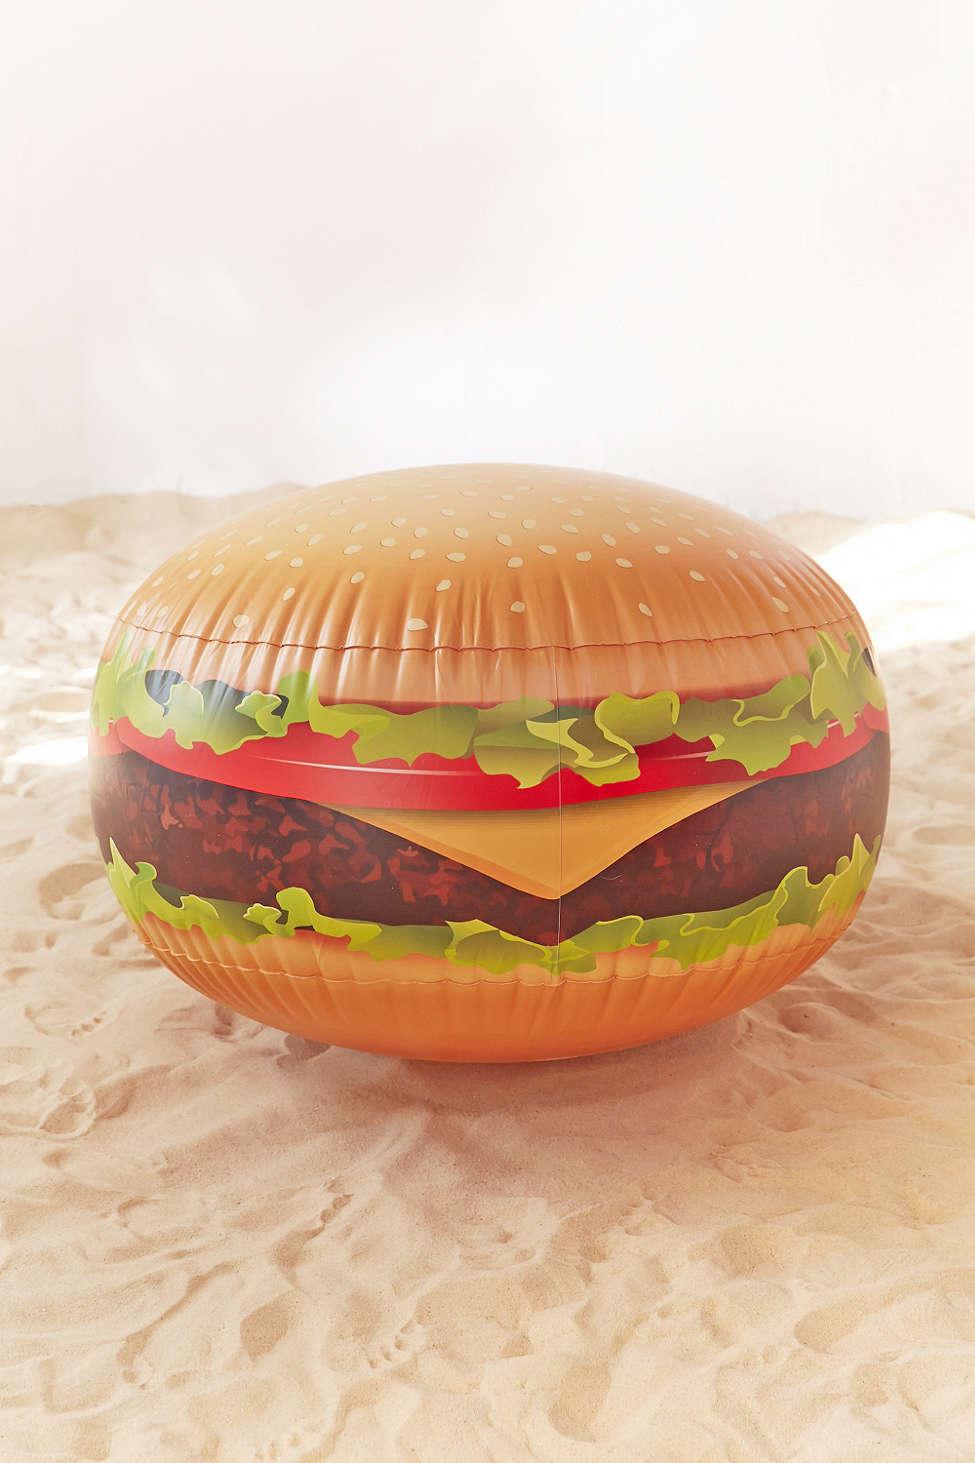 Cheeseburger Beach Ball  by Urban Outfitters $32